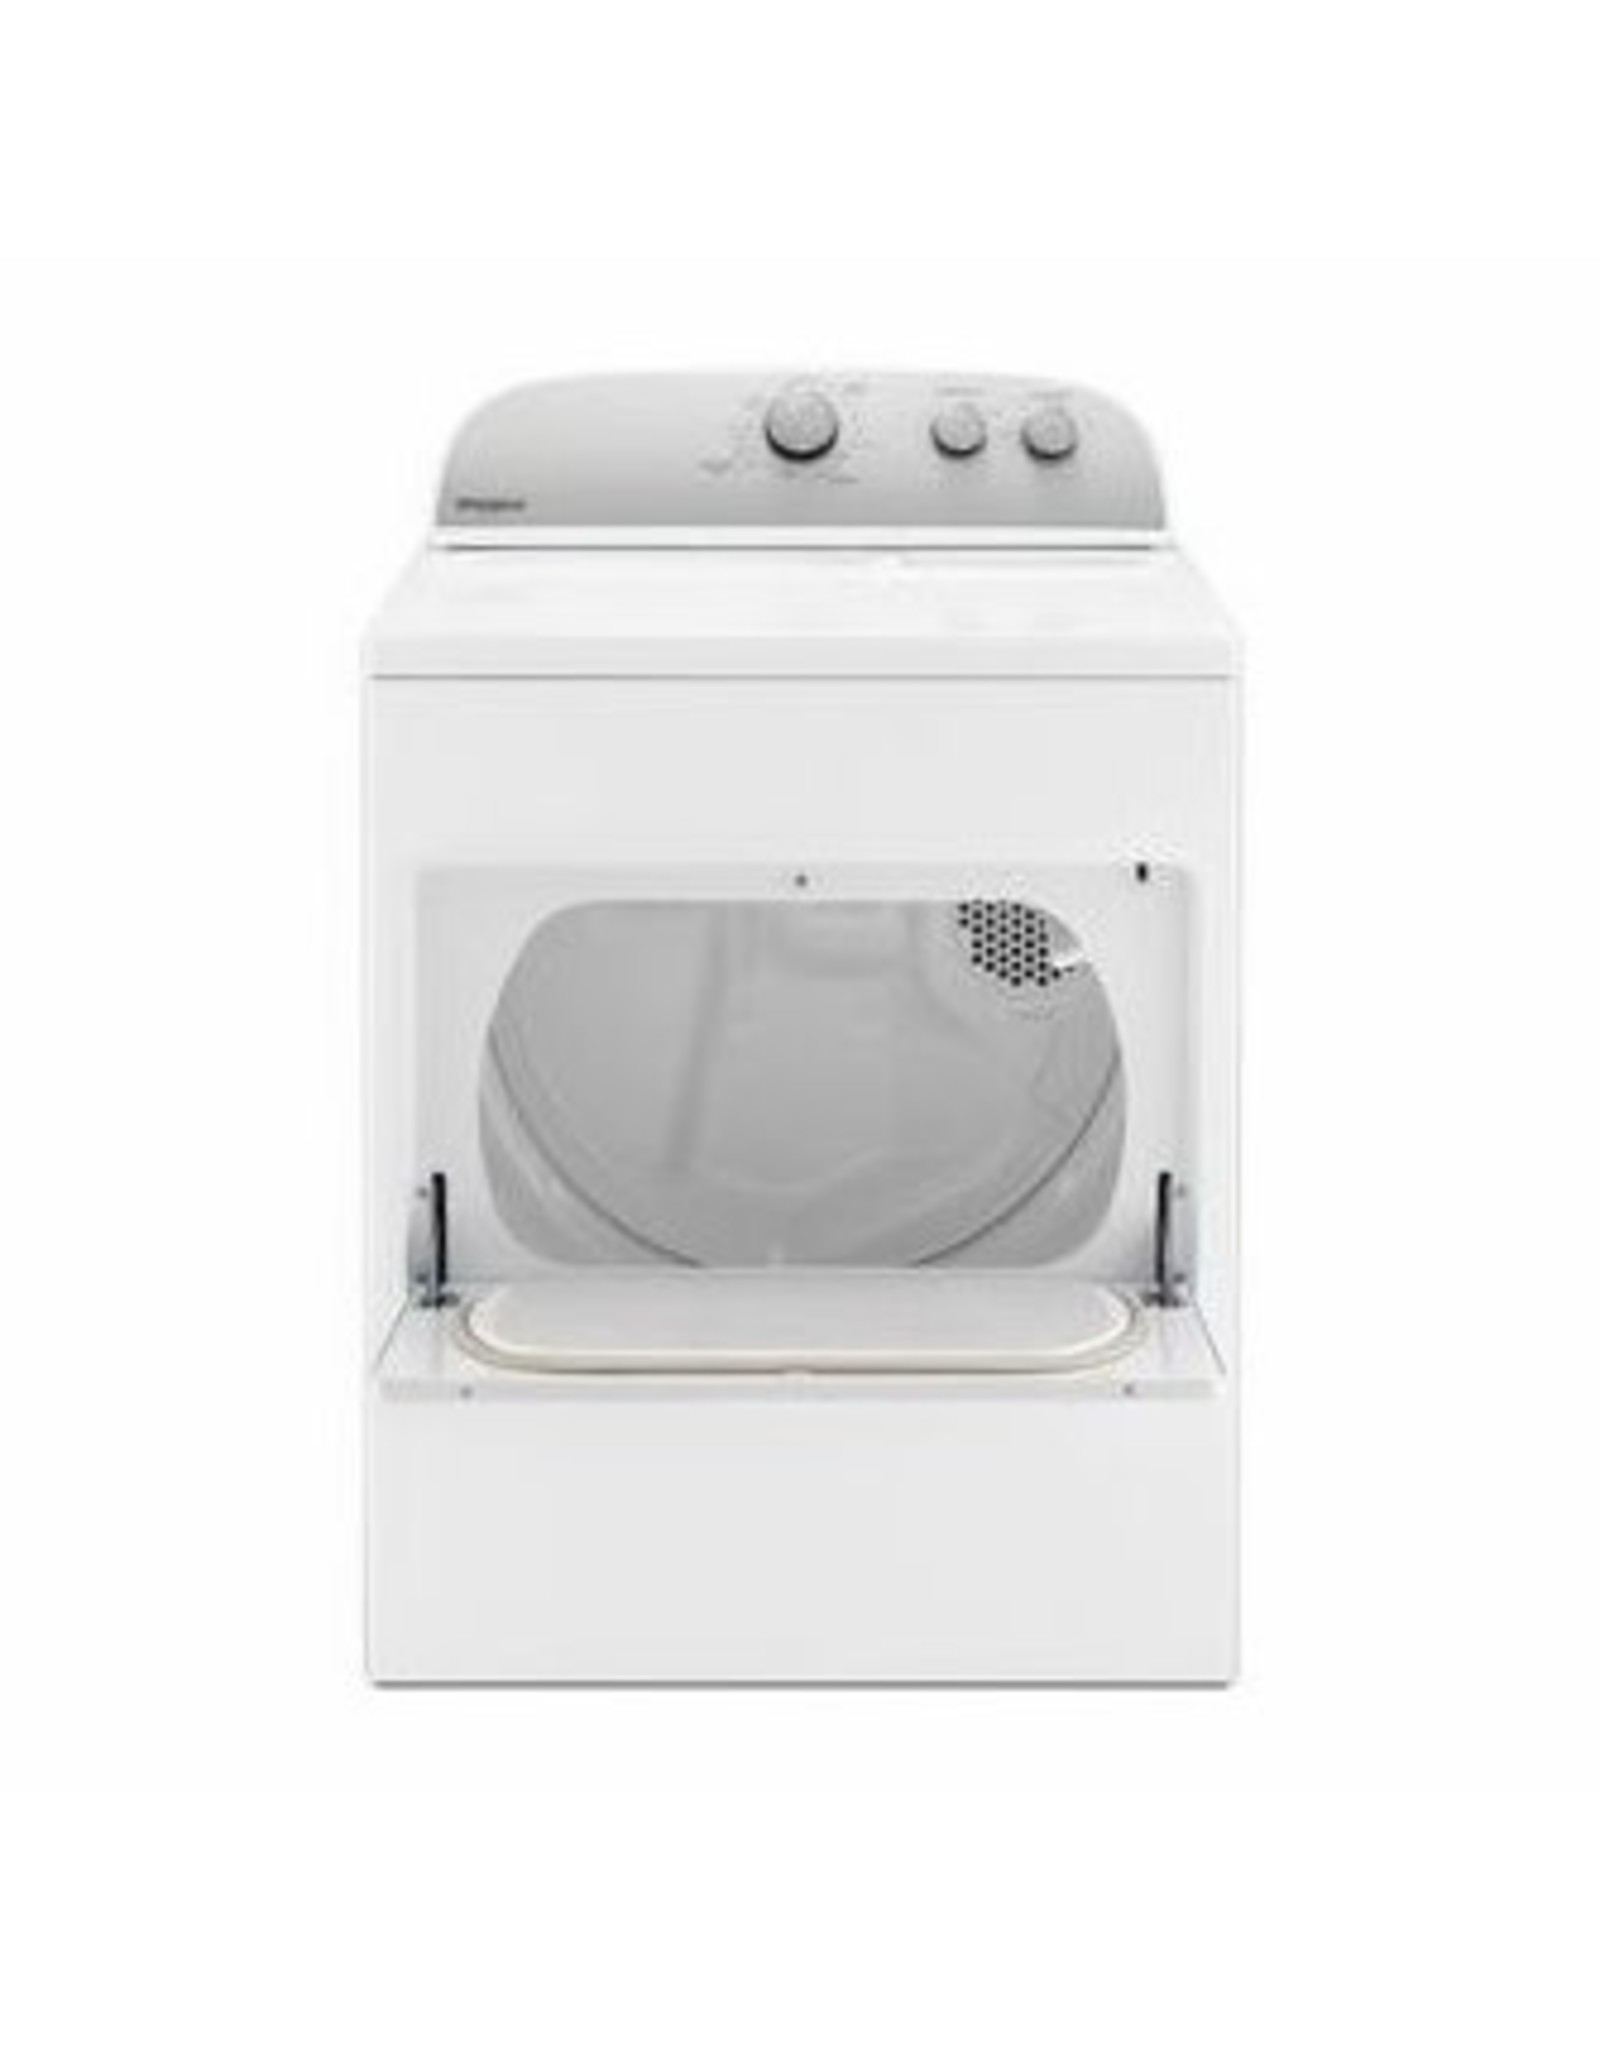 WGD4950HW WHR Air Vented - Dryer TL Matching - 29# WOD - GAS